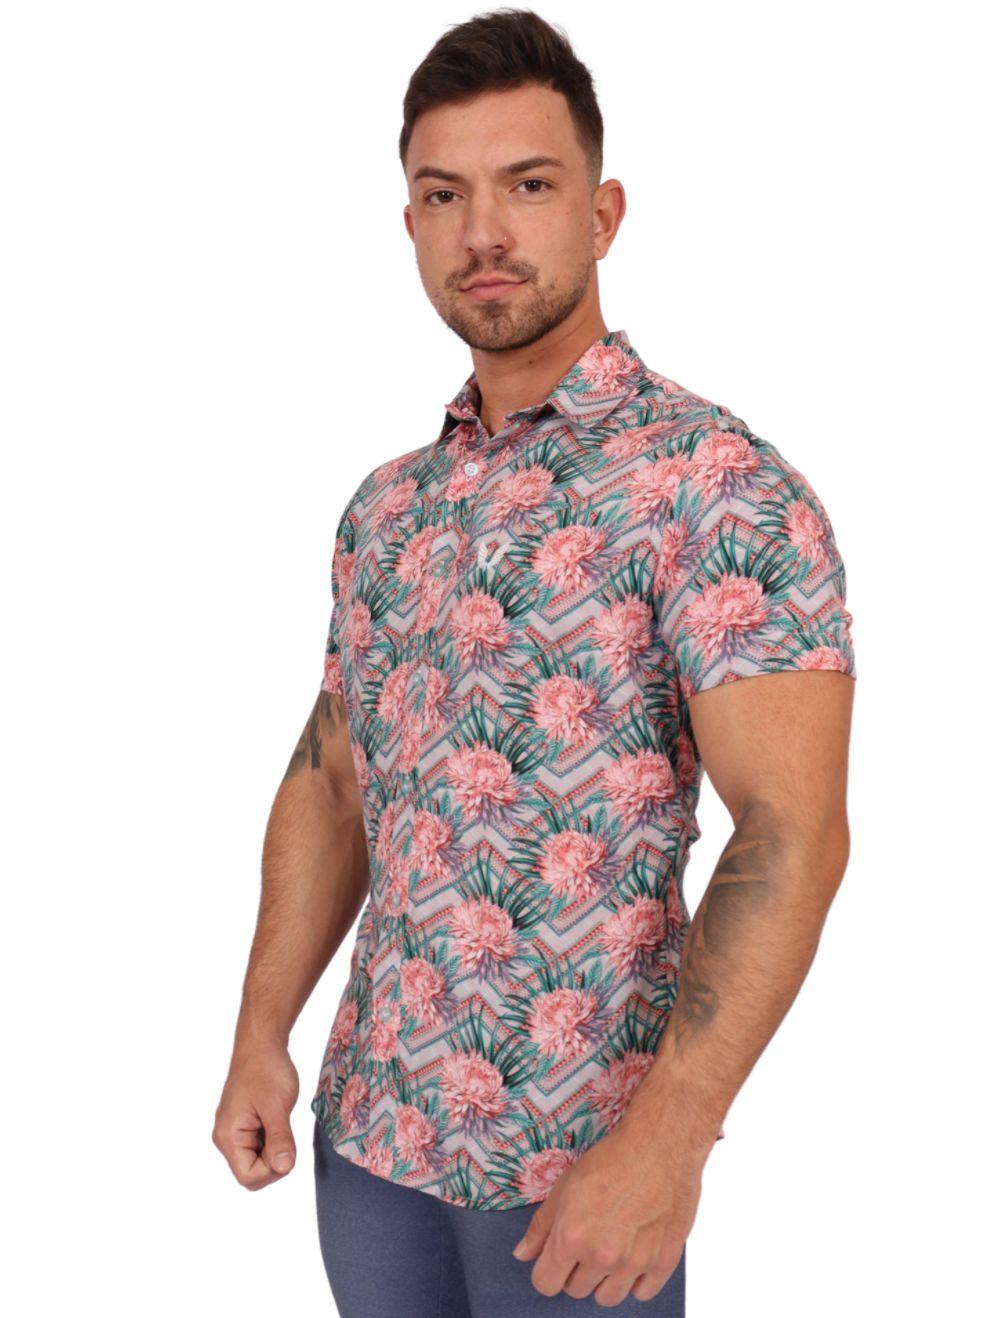 Camisa Masculina Slim Manga Curta Floral Colorida